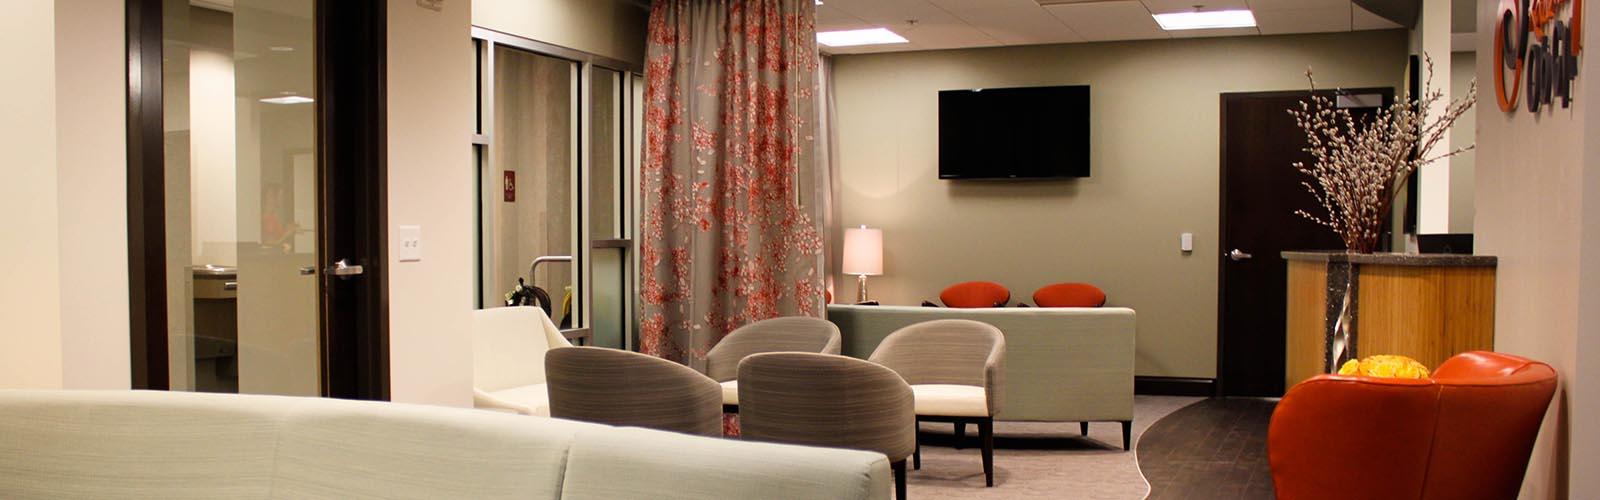 HMN Architects Expertise   Interior Design